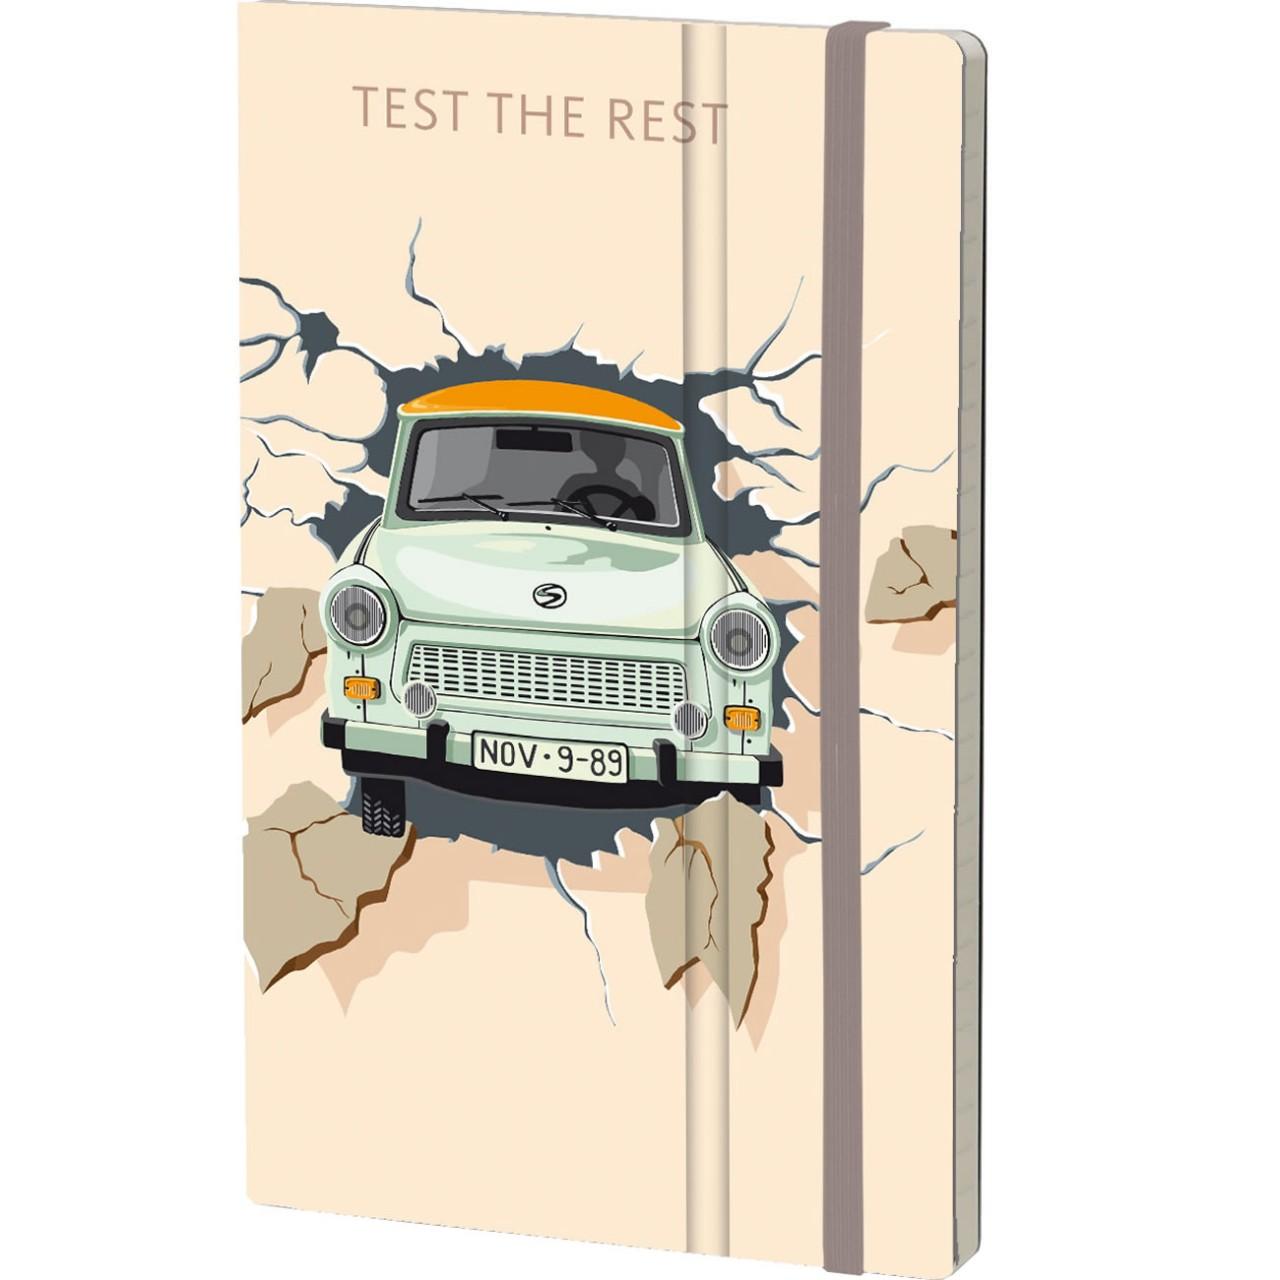 Stifflex Notizbuch THE WALL 13 x 21 cm 192 S., TEST THE REST - ORANGE